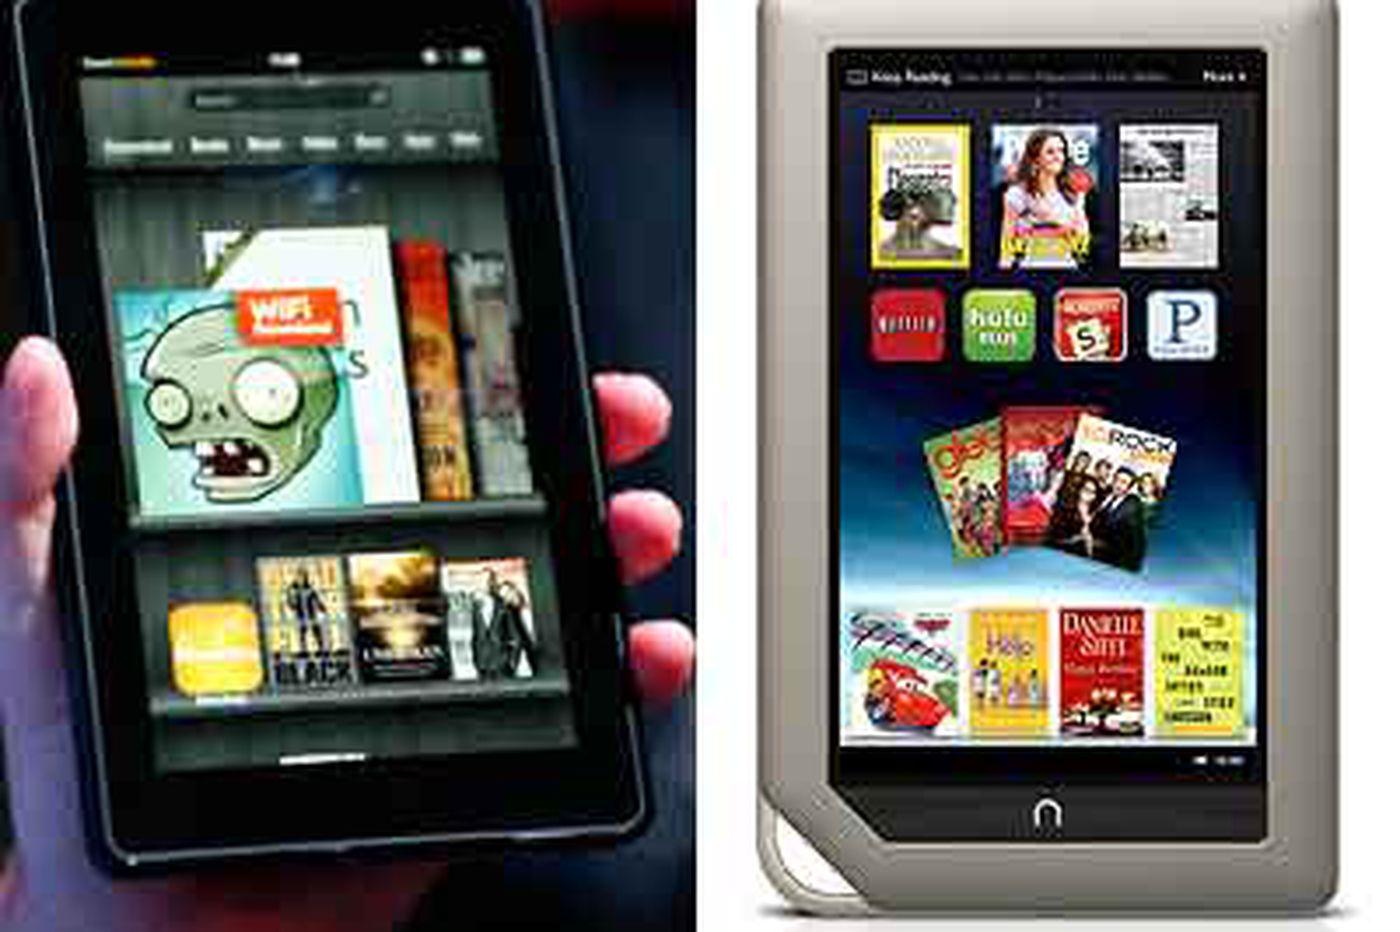 Jeff Gelles: Kindle Fire vs. Nook Tablet: A closer look